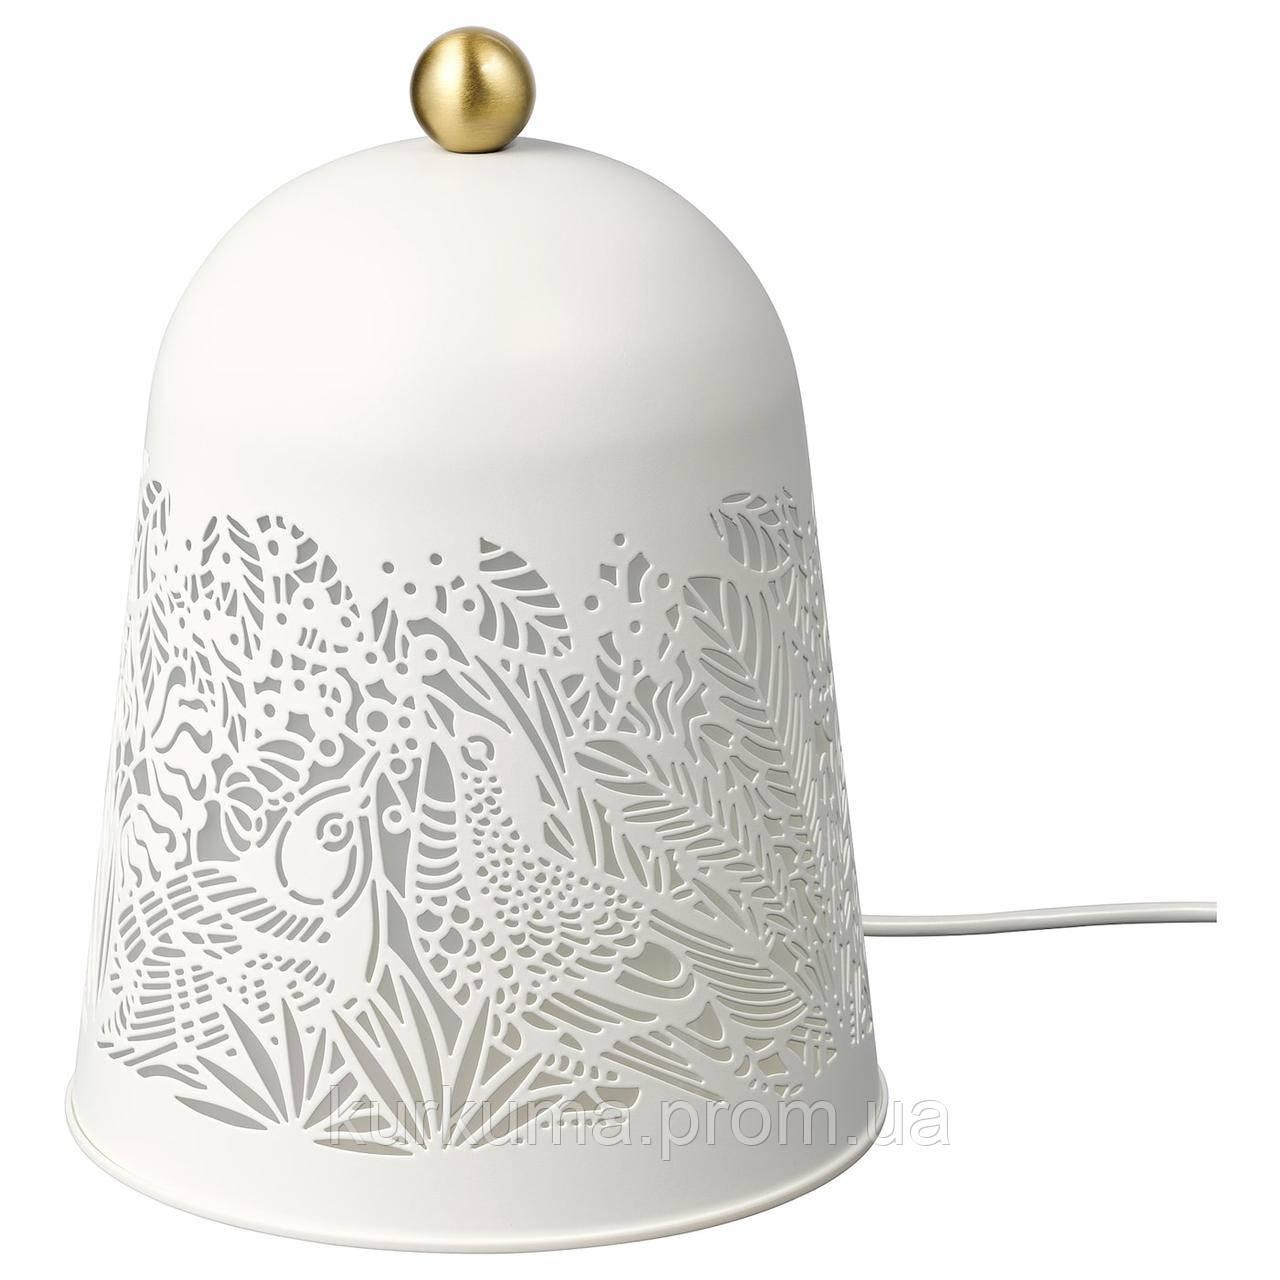 IKEA SOLSKUR Светодиодная настольная лампа, белый, латунный цвет (104.245.17)